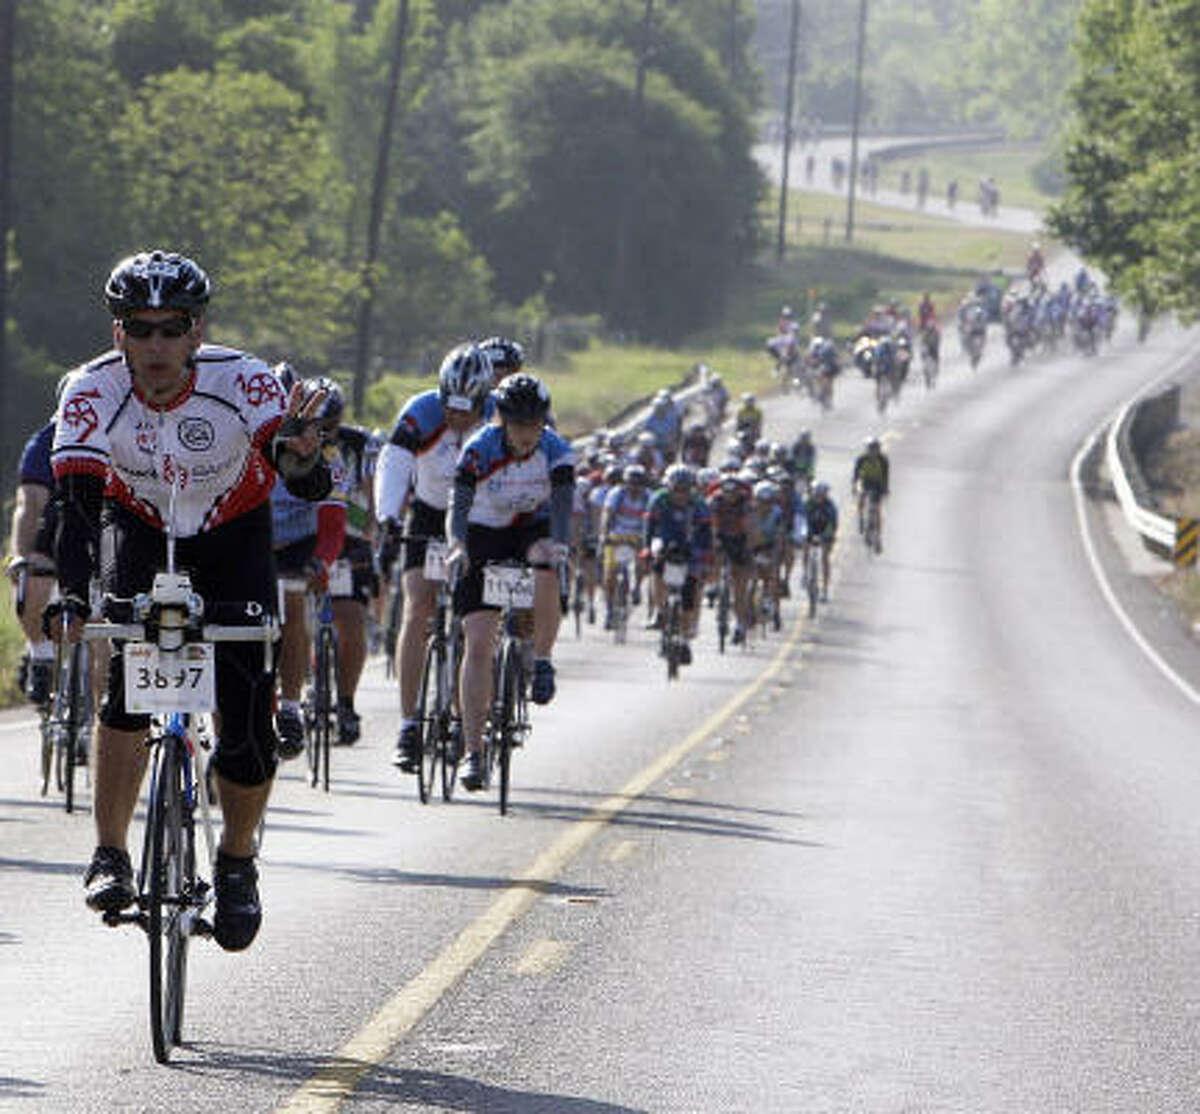 Rider Edward Raudez flashes a peace sign.